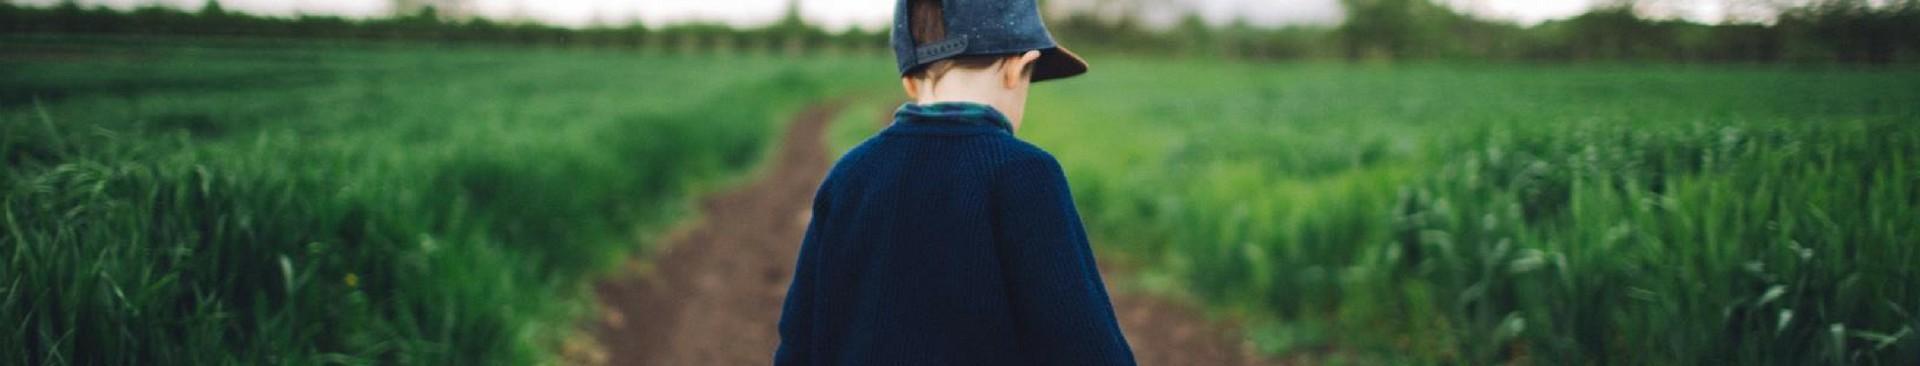 child on farm